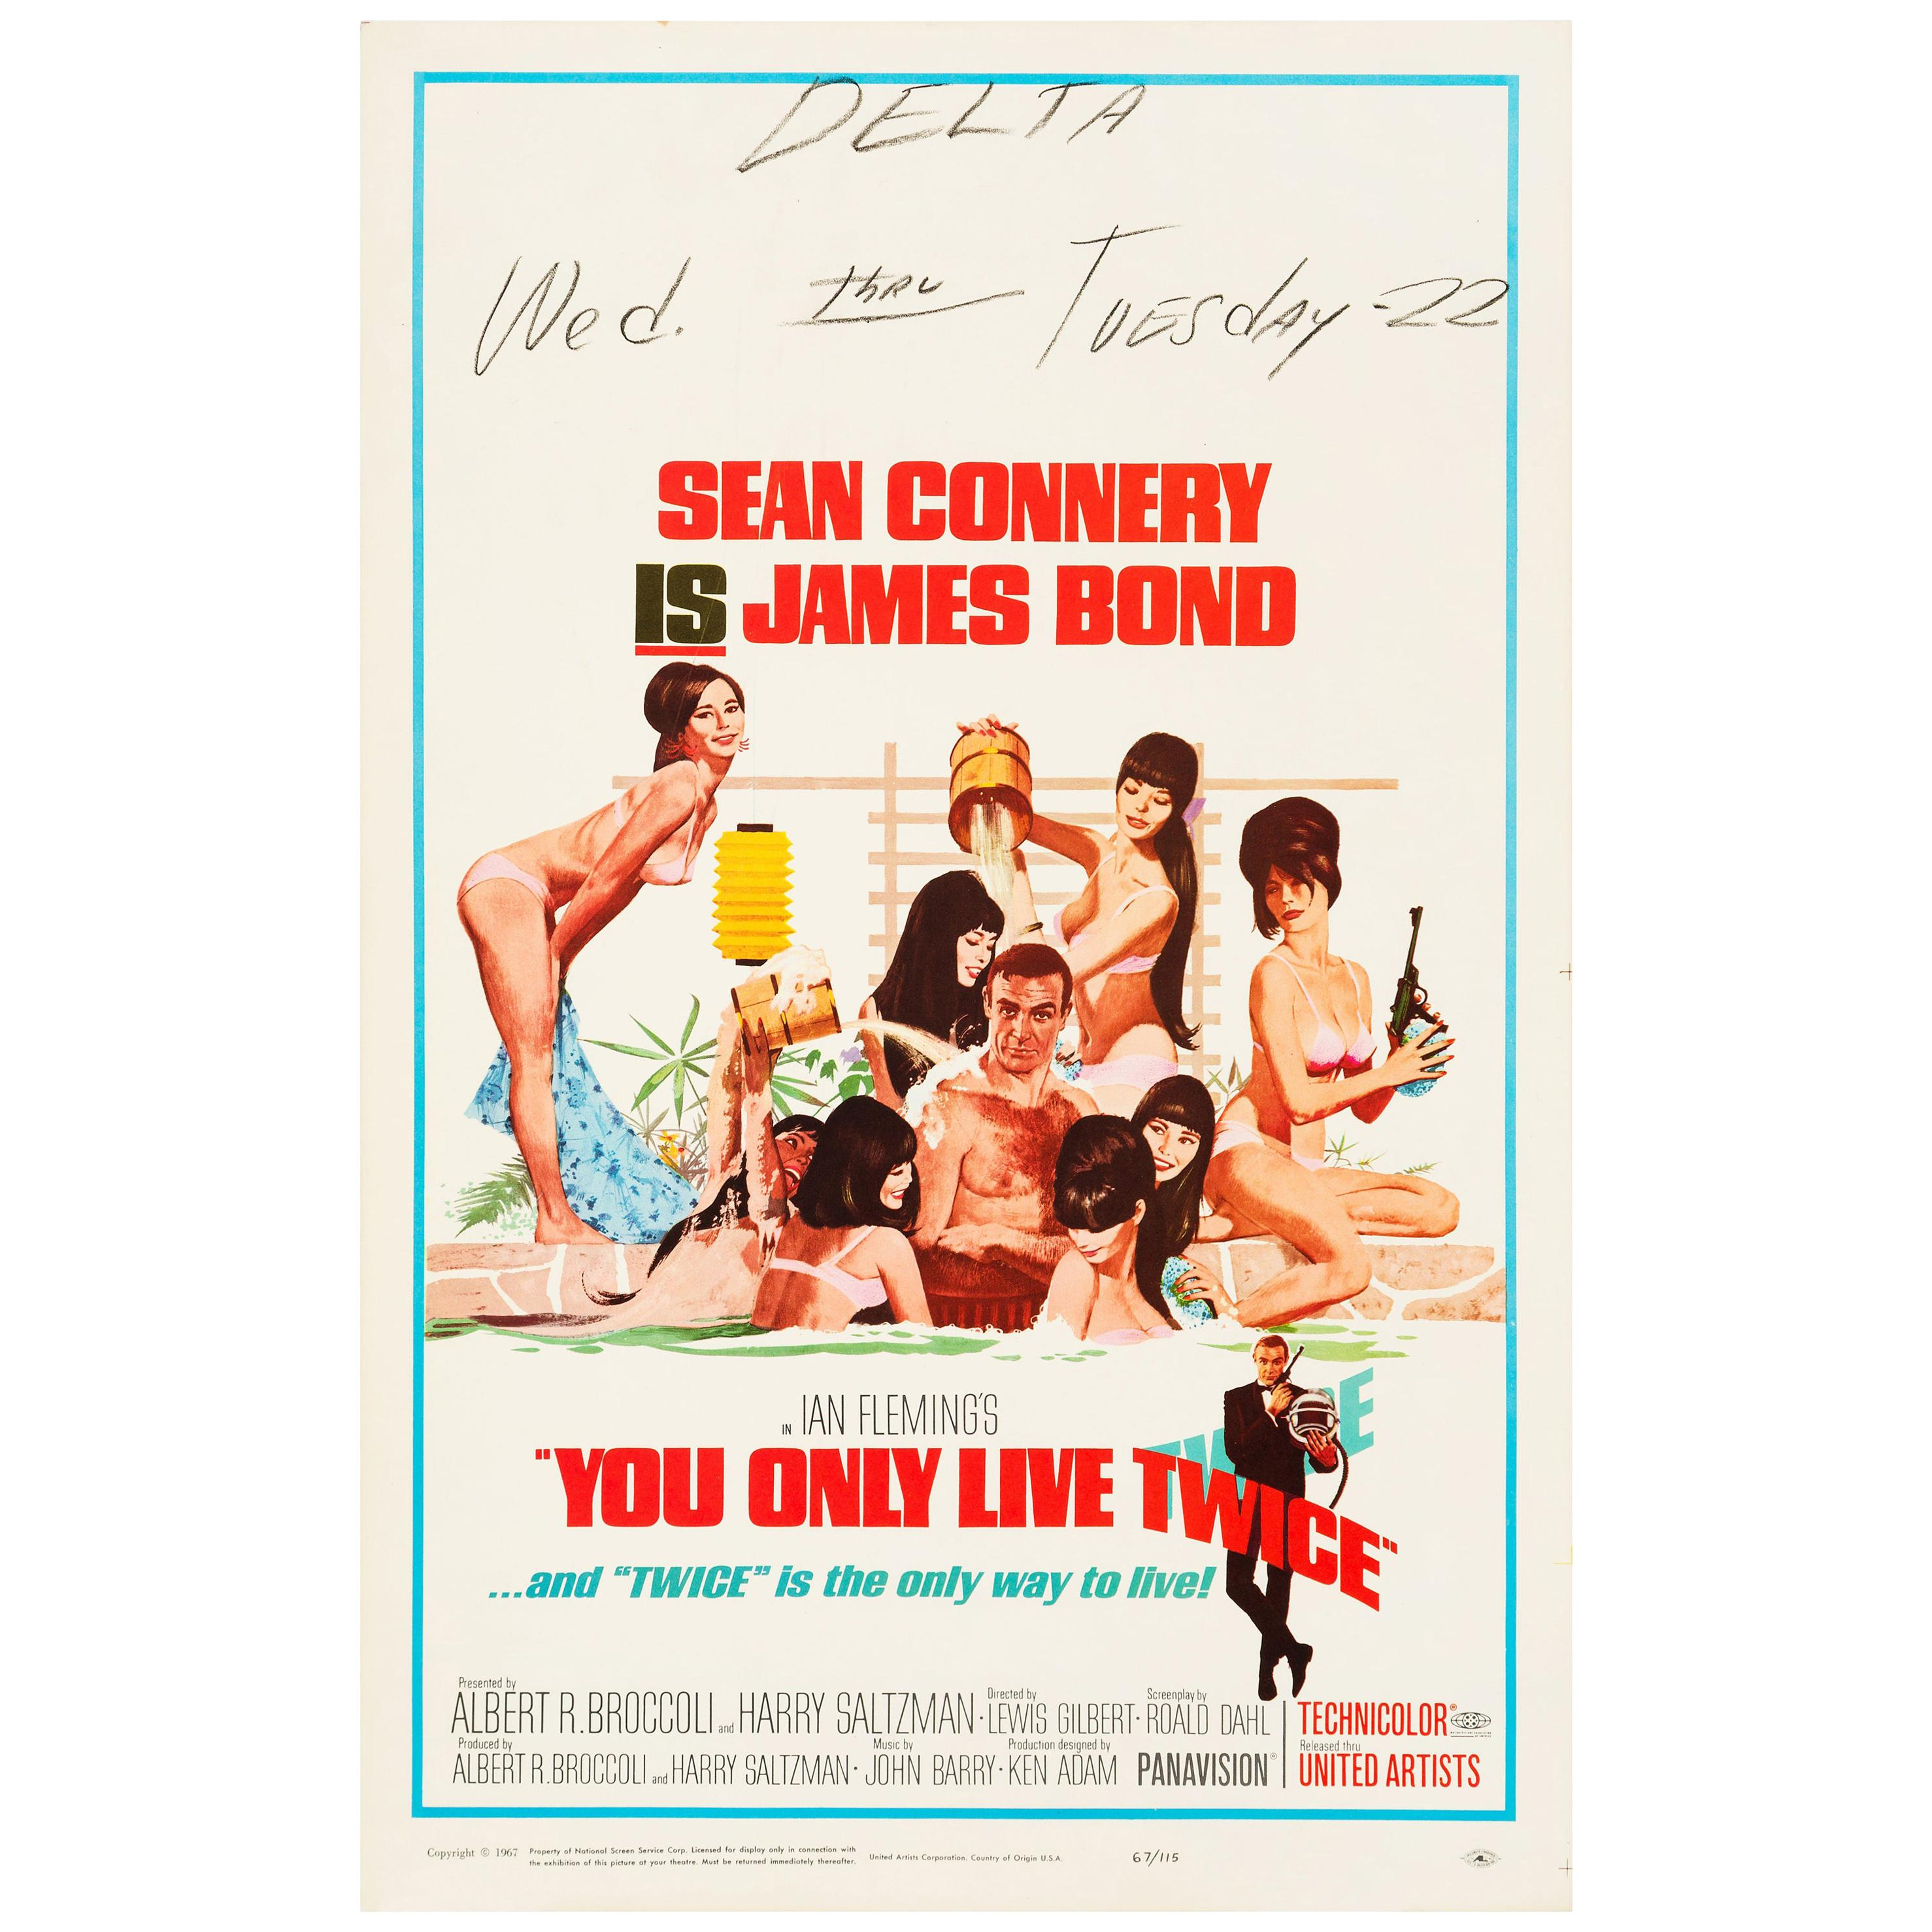 James Bond 'You Only Live Twice' Original Vintage Movie Poster, 1967